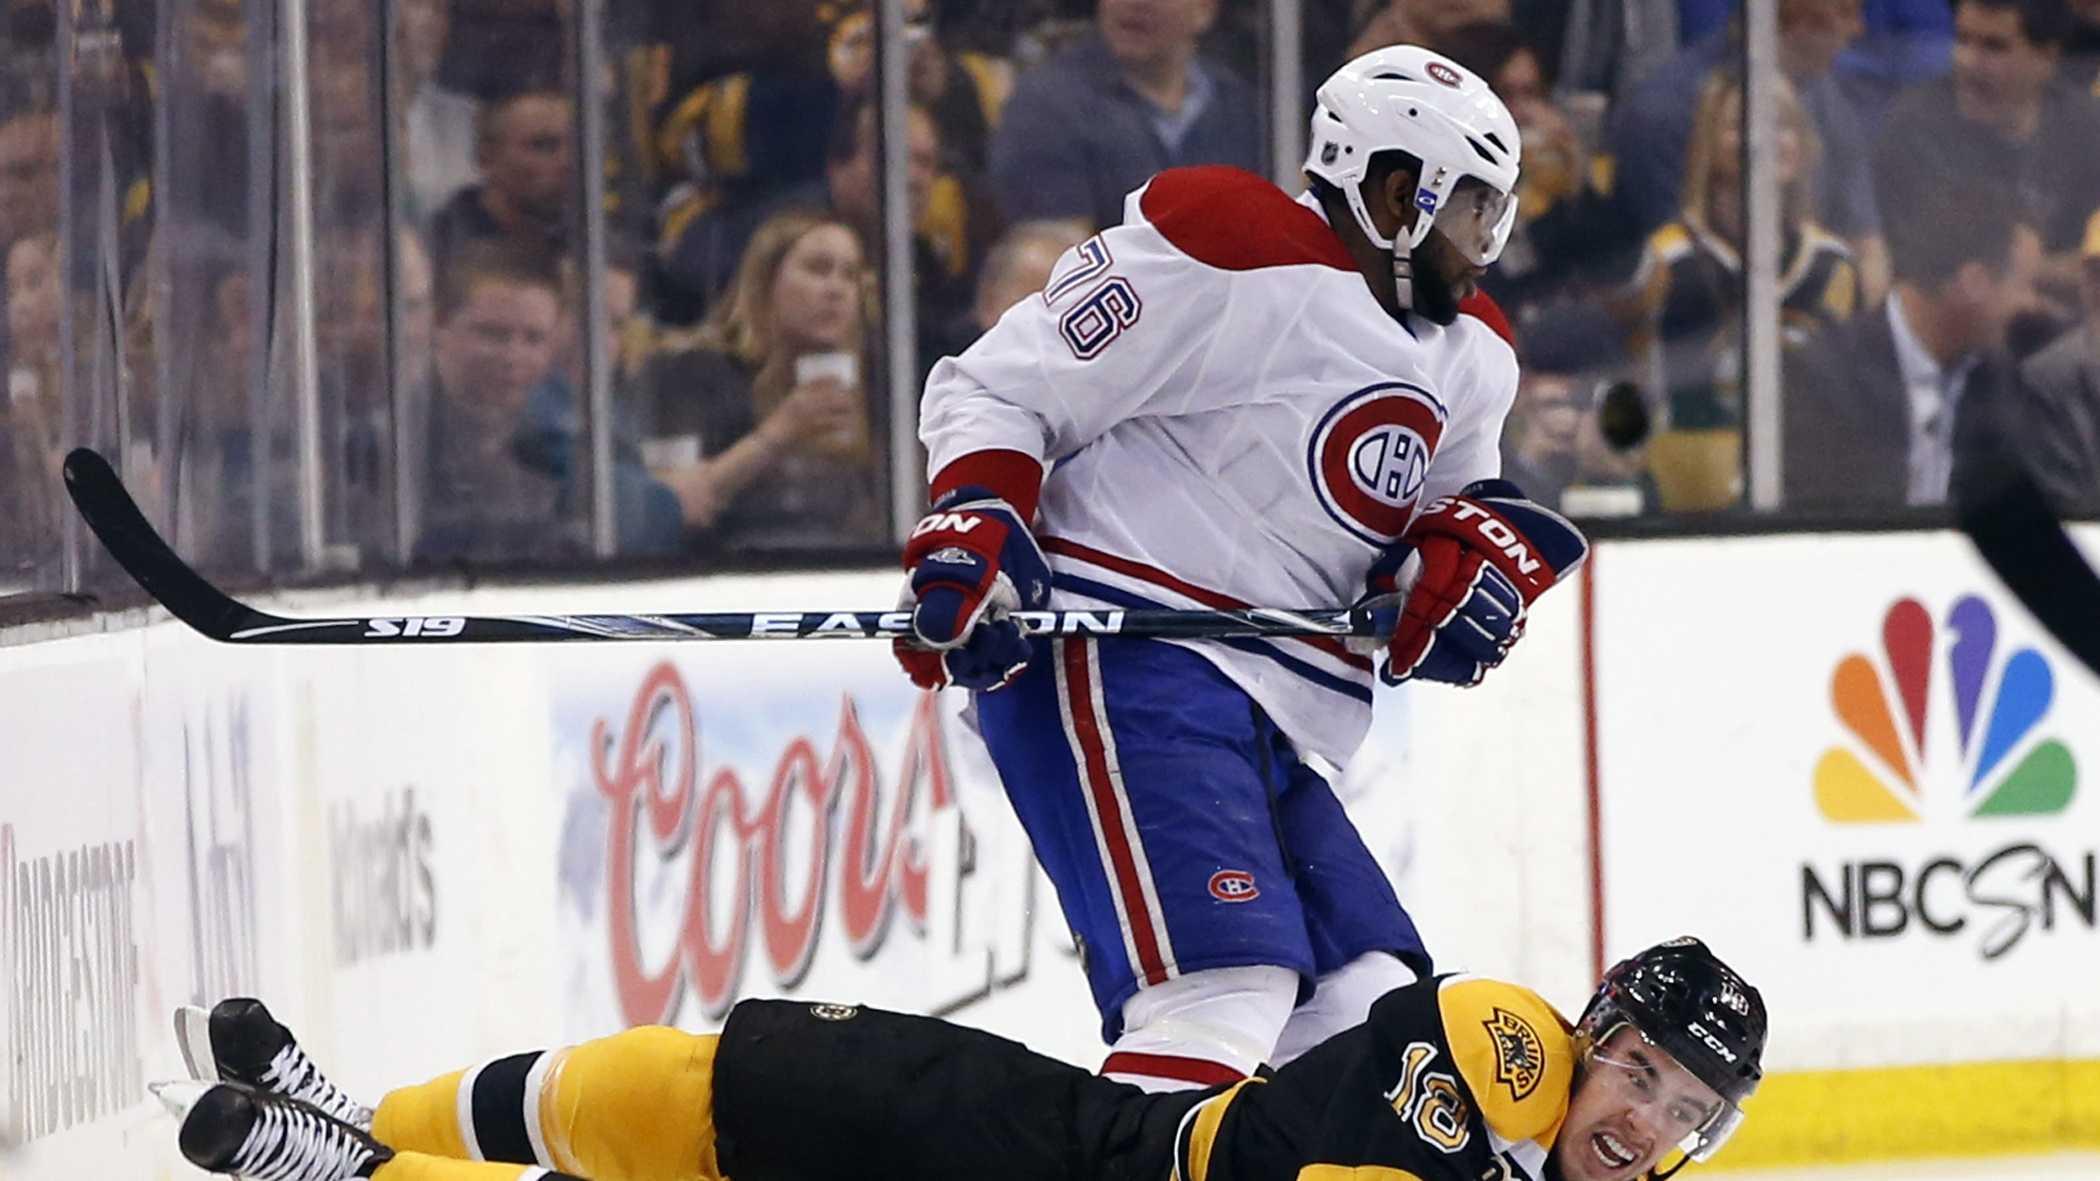 Bruins Canadiens Gm 1 5.1.14